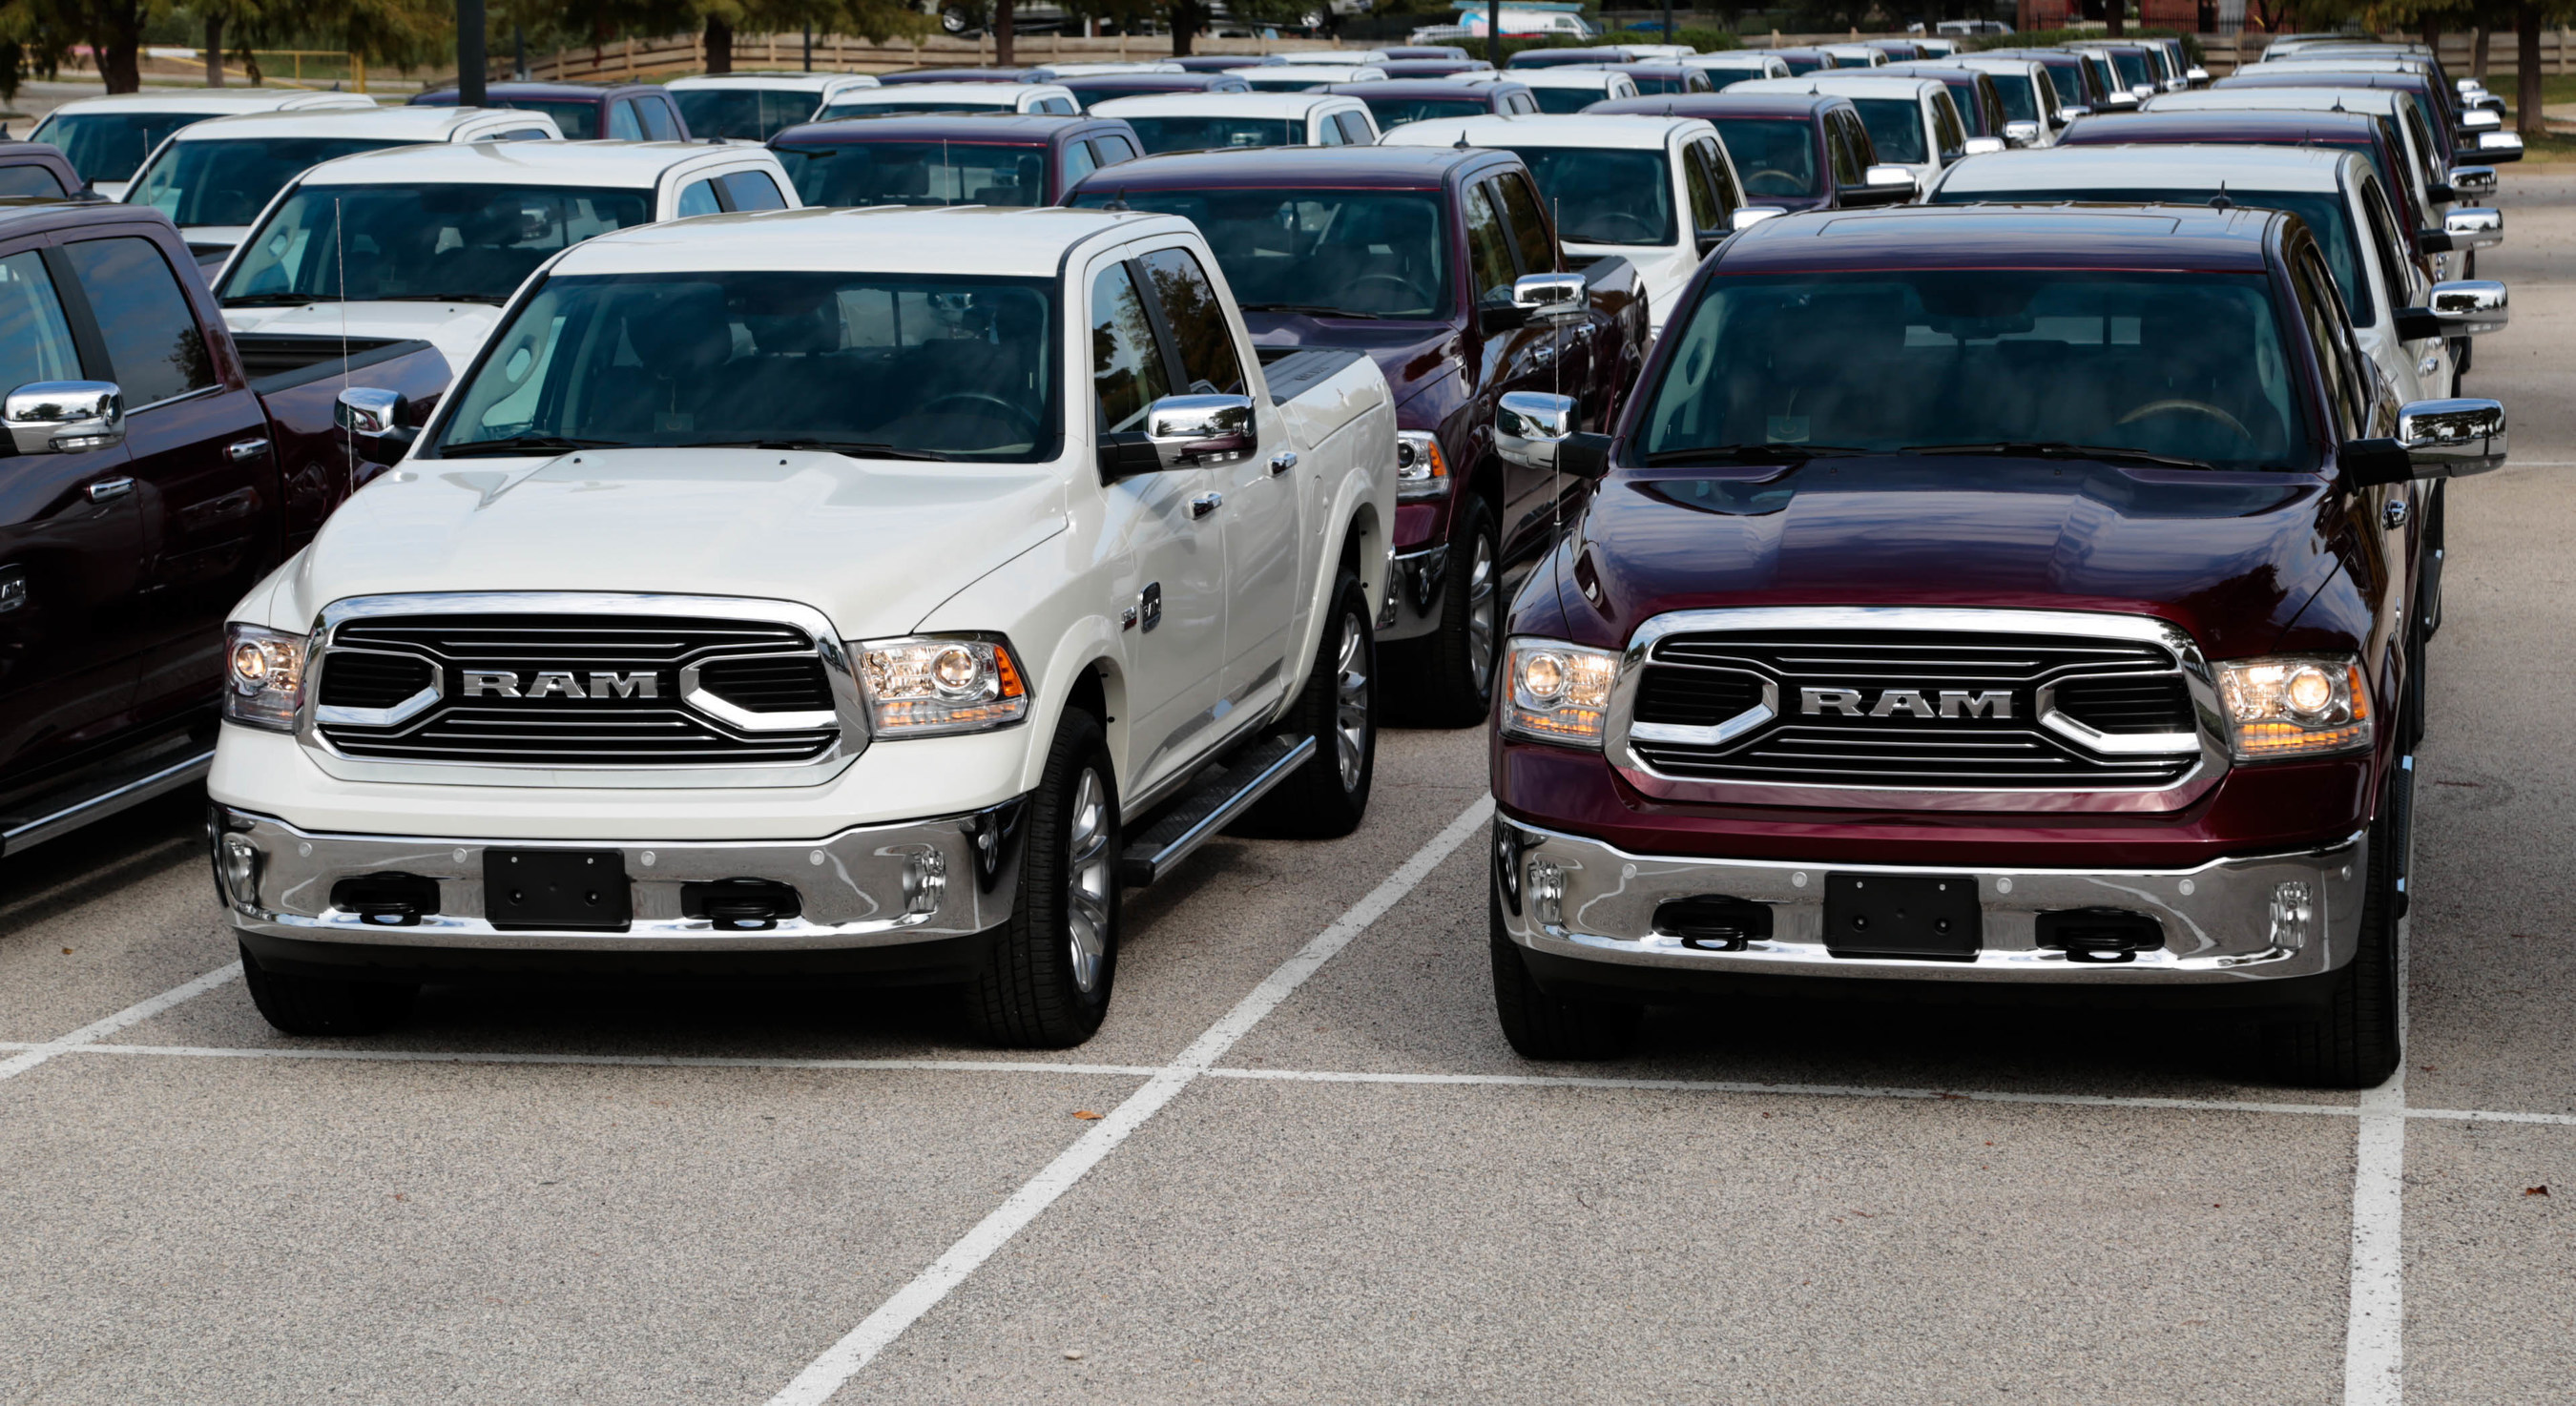 Ram hosts giant 400-truck dealer drive-away event in Dallas to celebrate Ram Laramie Longhorn's Texas Auto Writers Association Luxury Pickup Truck of Texas award.